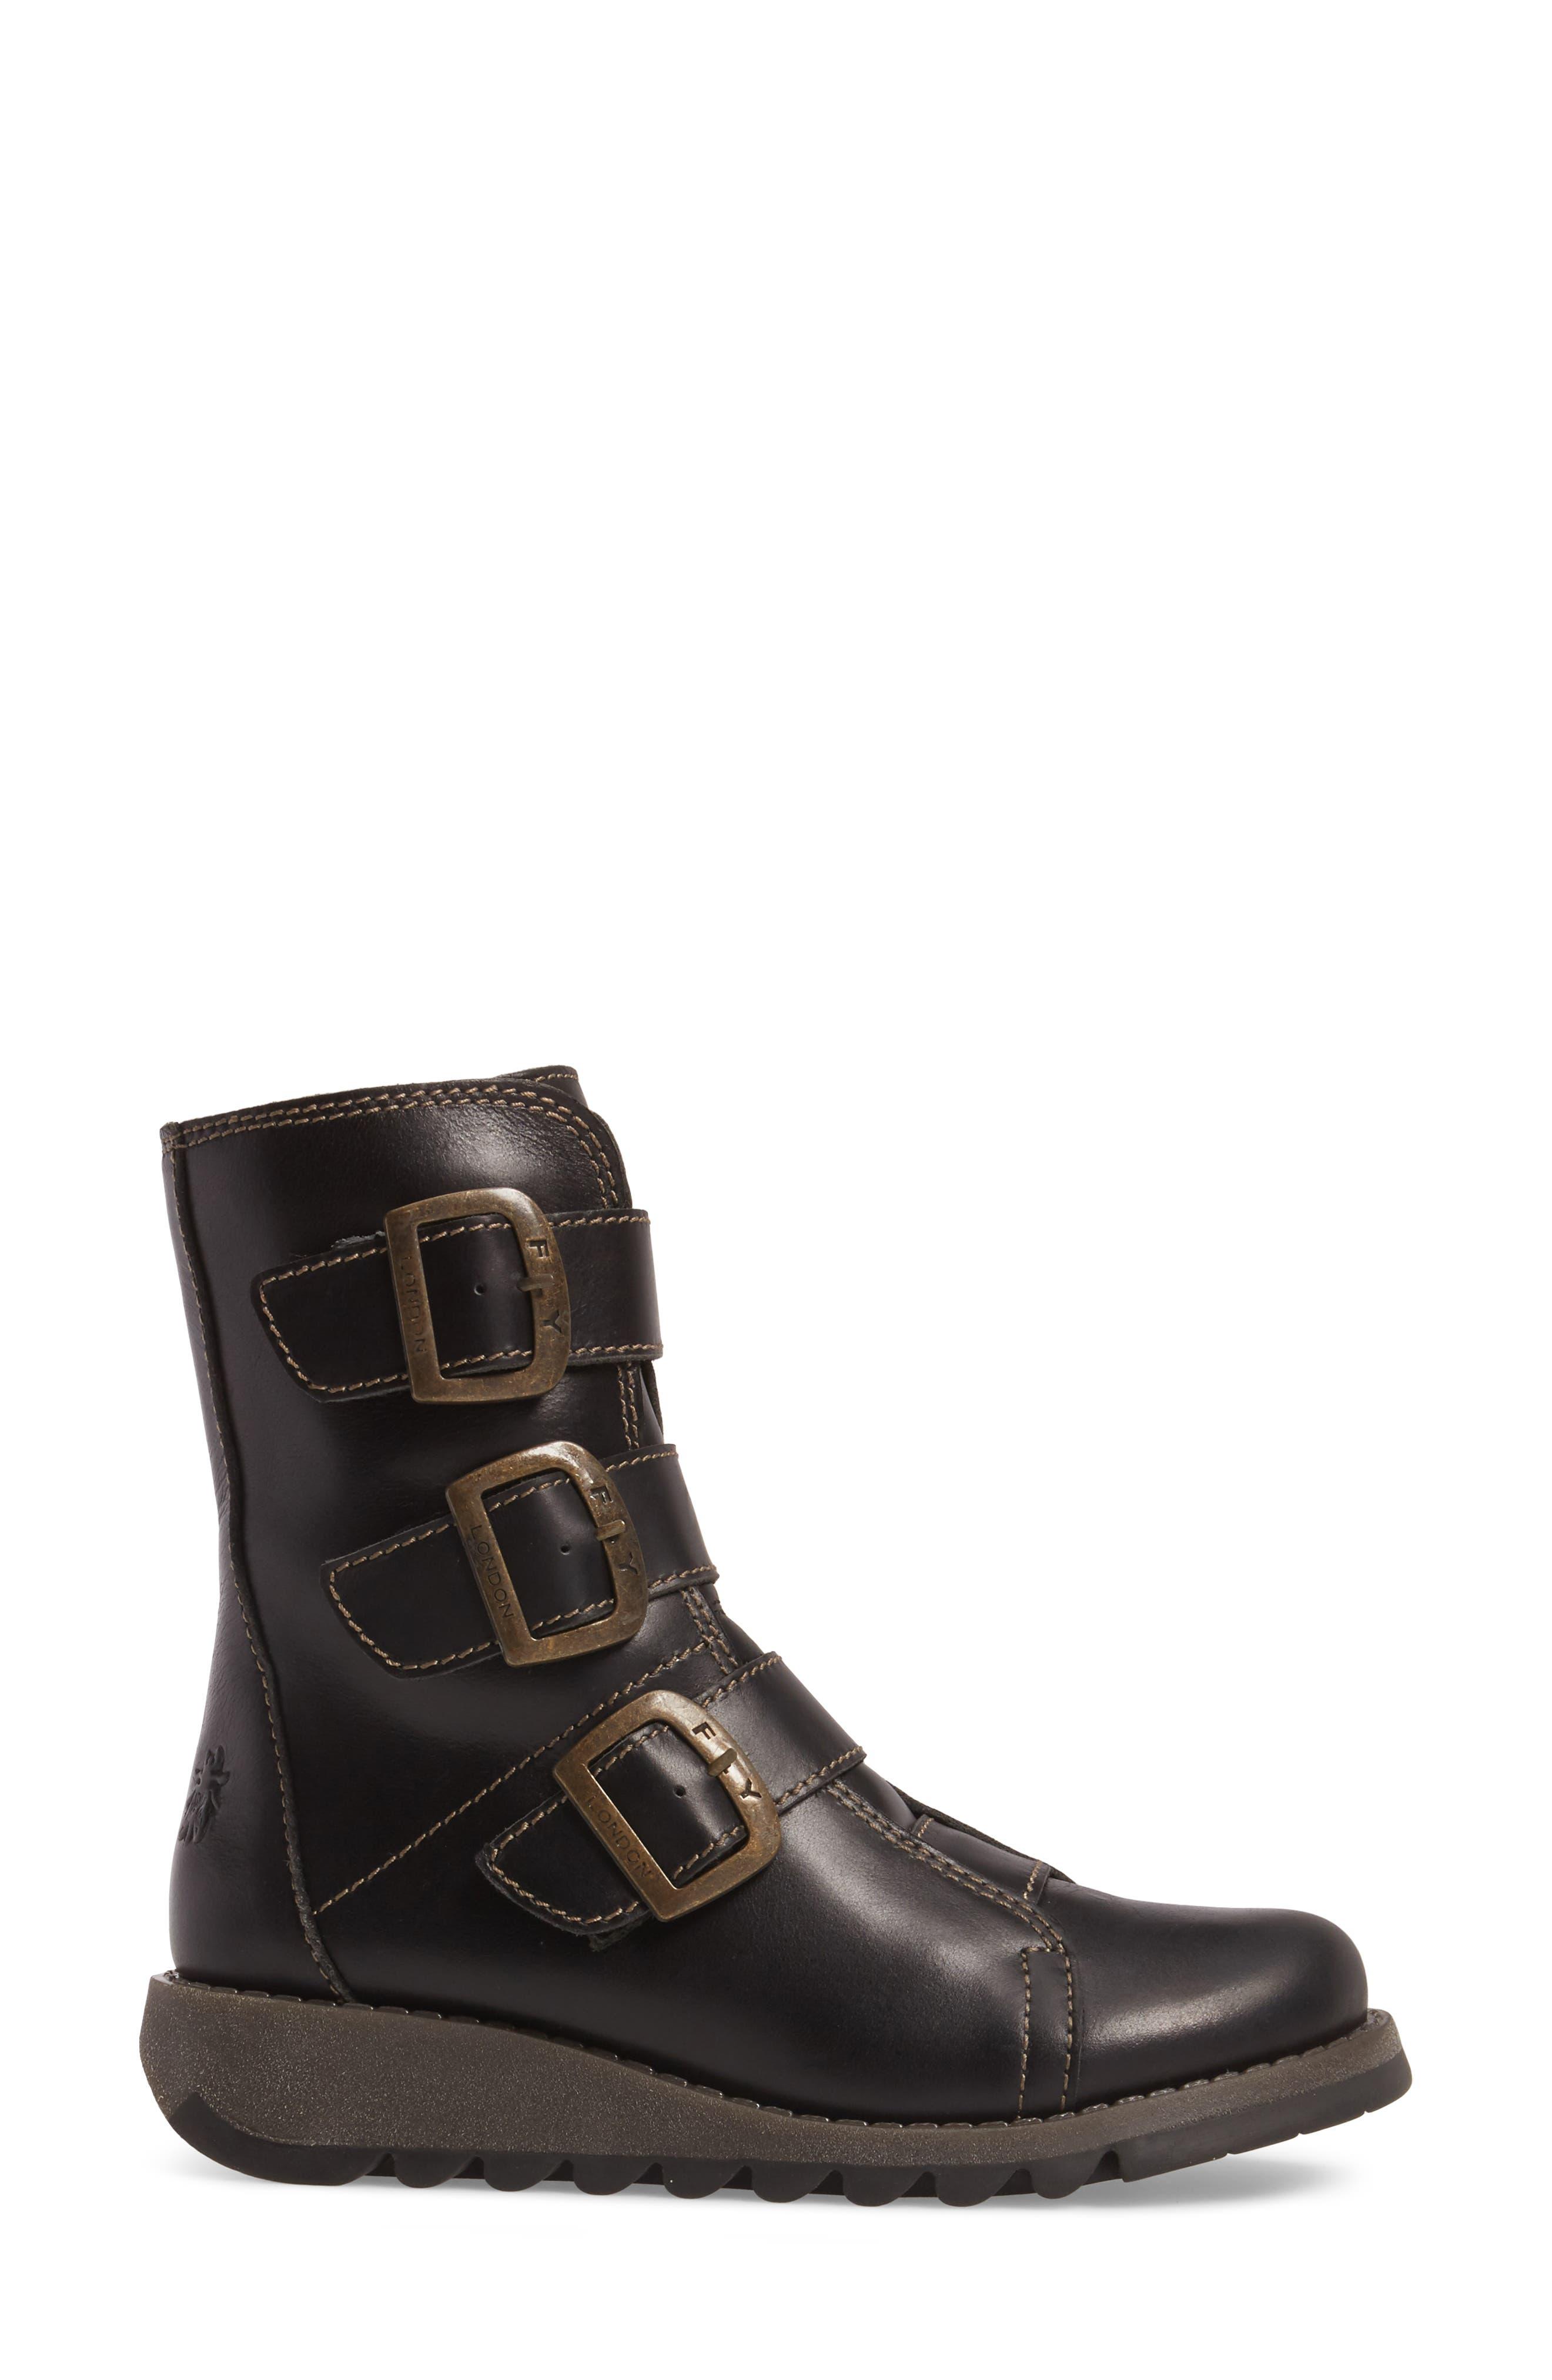 Scop Boot,                             Alternate thumbnail 3, color,                             Black Leather